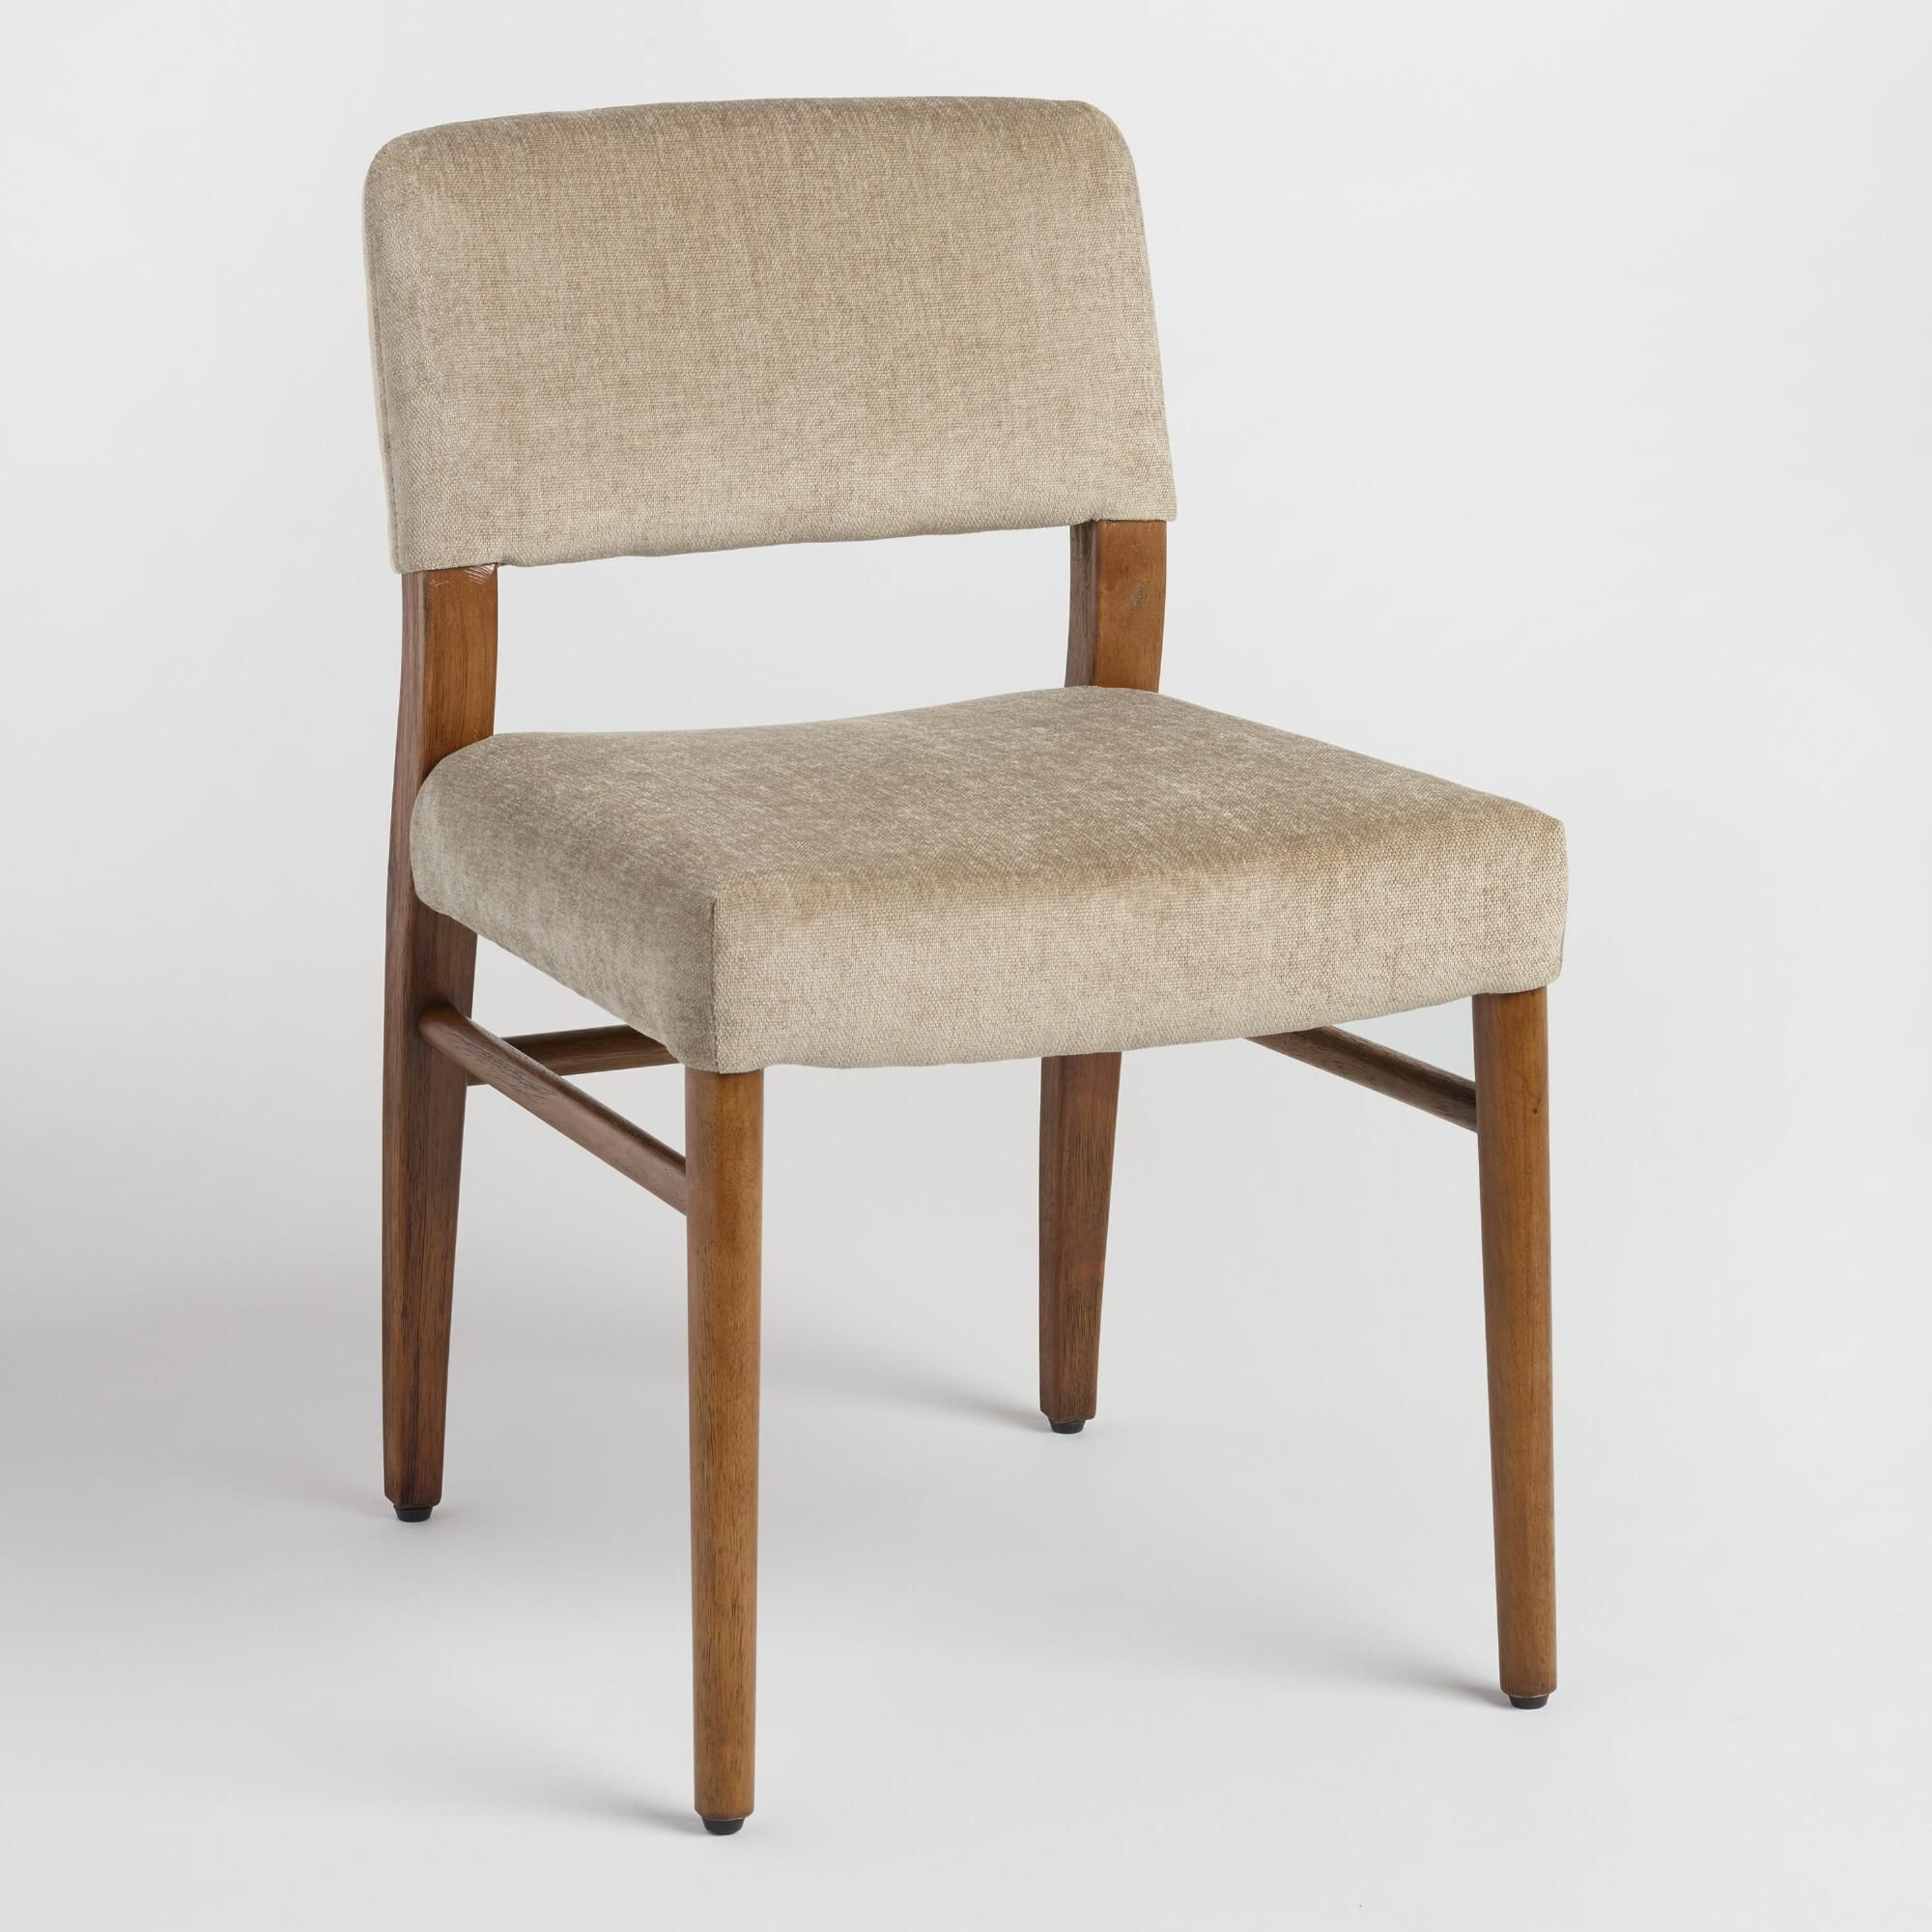 Cocoa elysse split back upholstered chairs set of 2